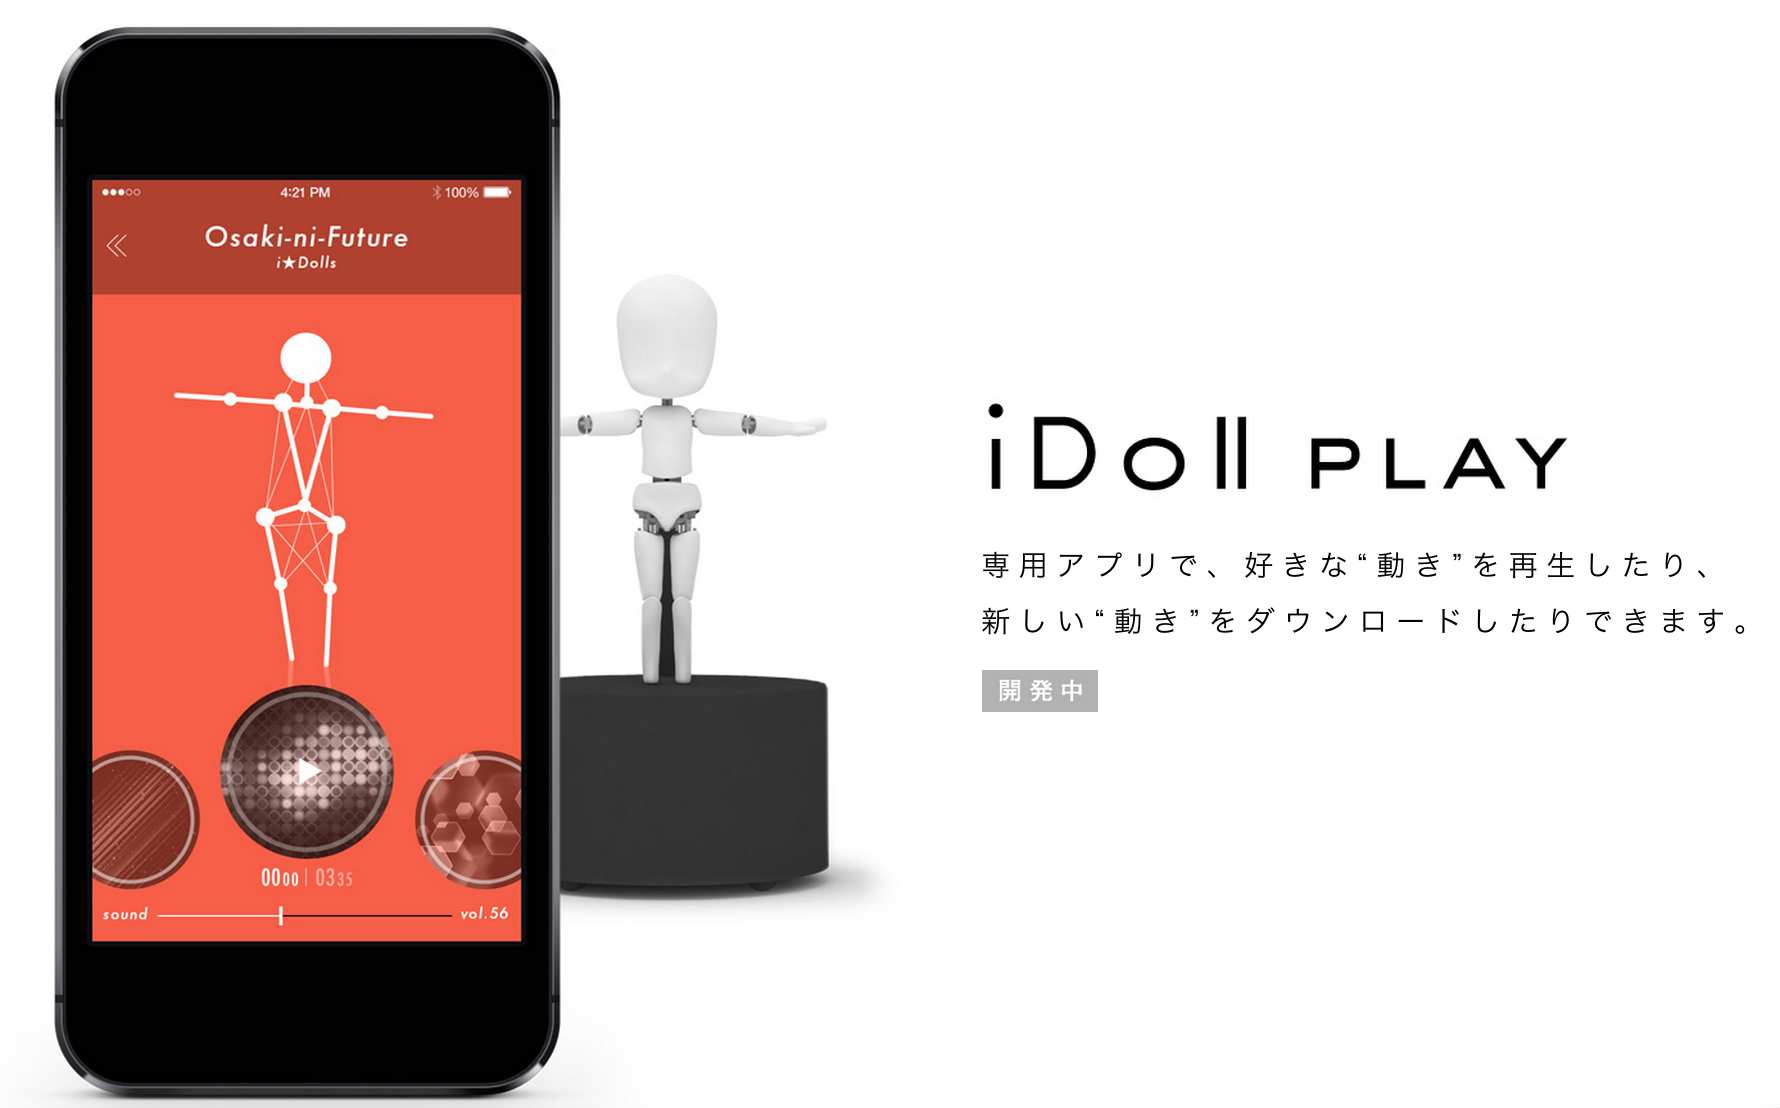 idoll hakuhodo robot doll moe otaku character south by southwest austin interactive festival